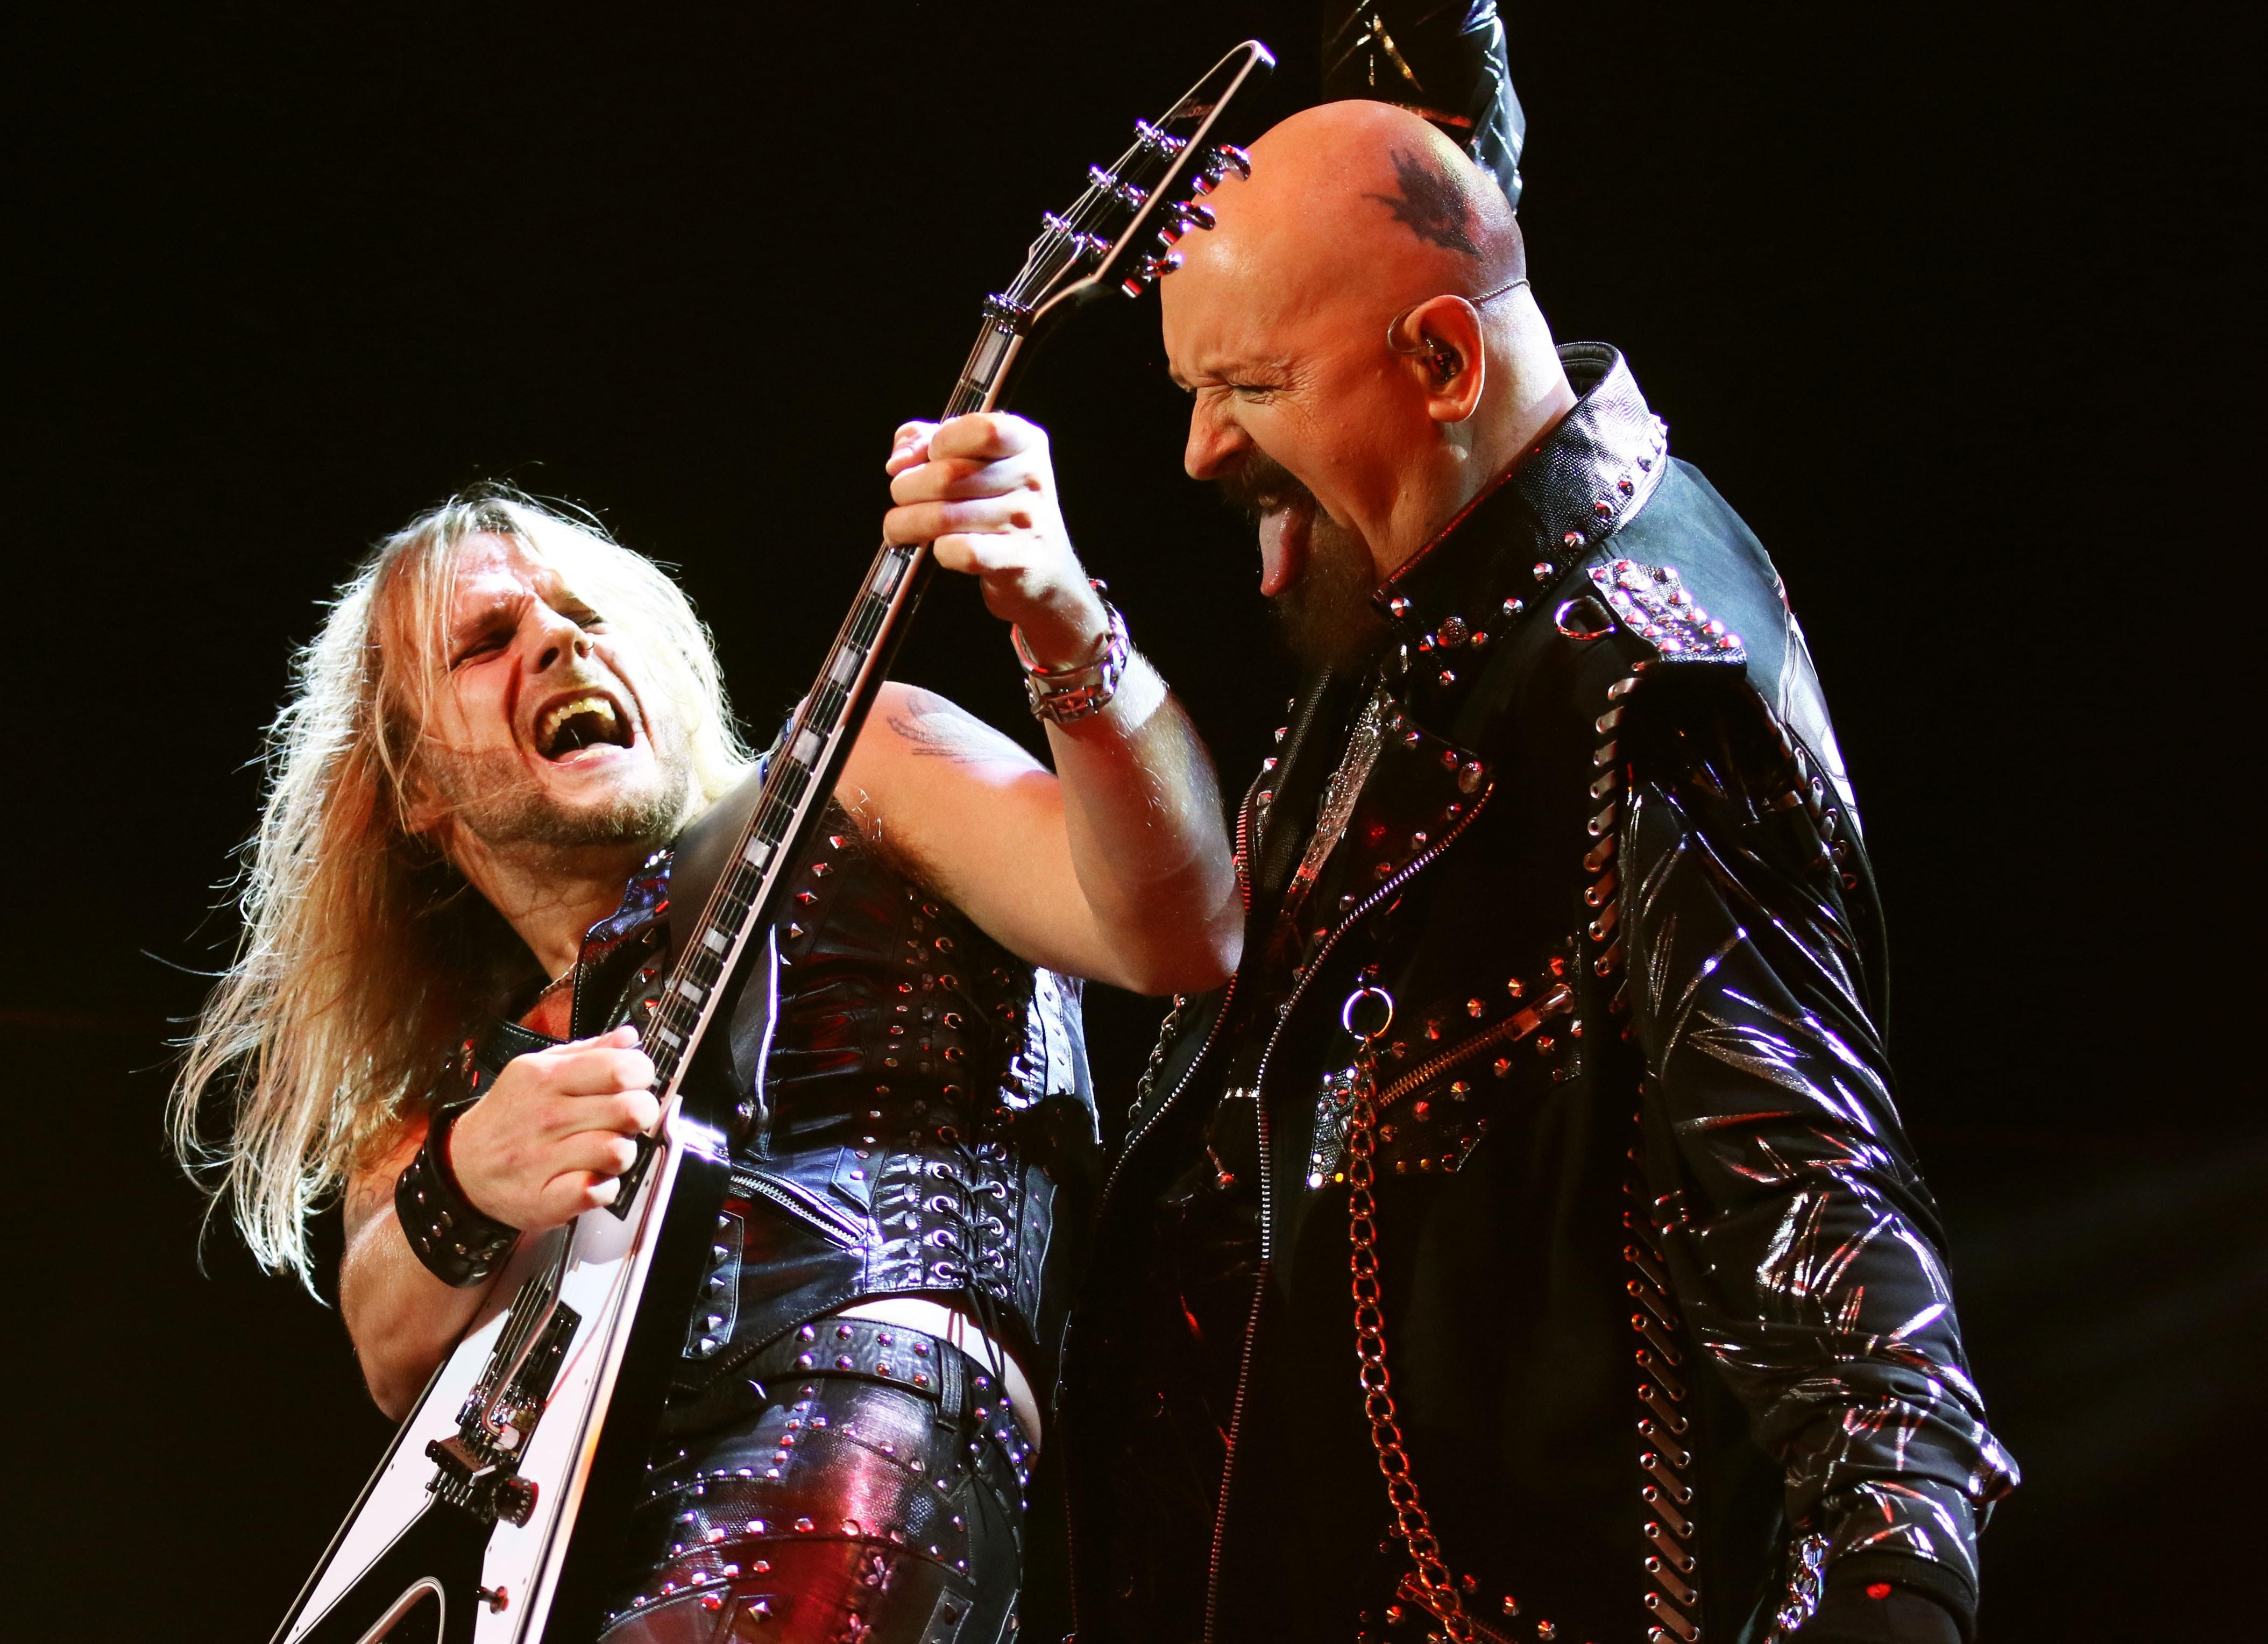 Judas Priest High Definition Wallpapers